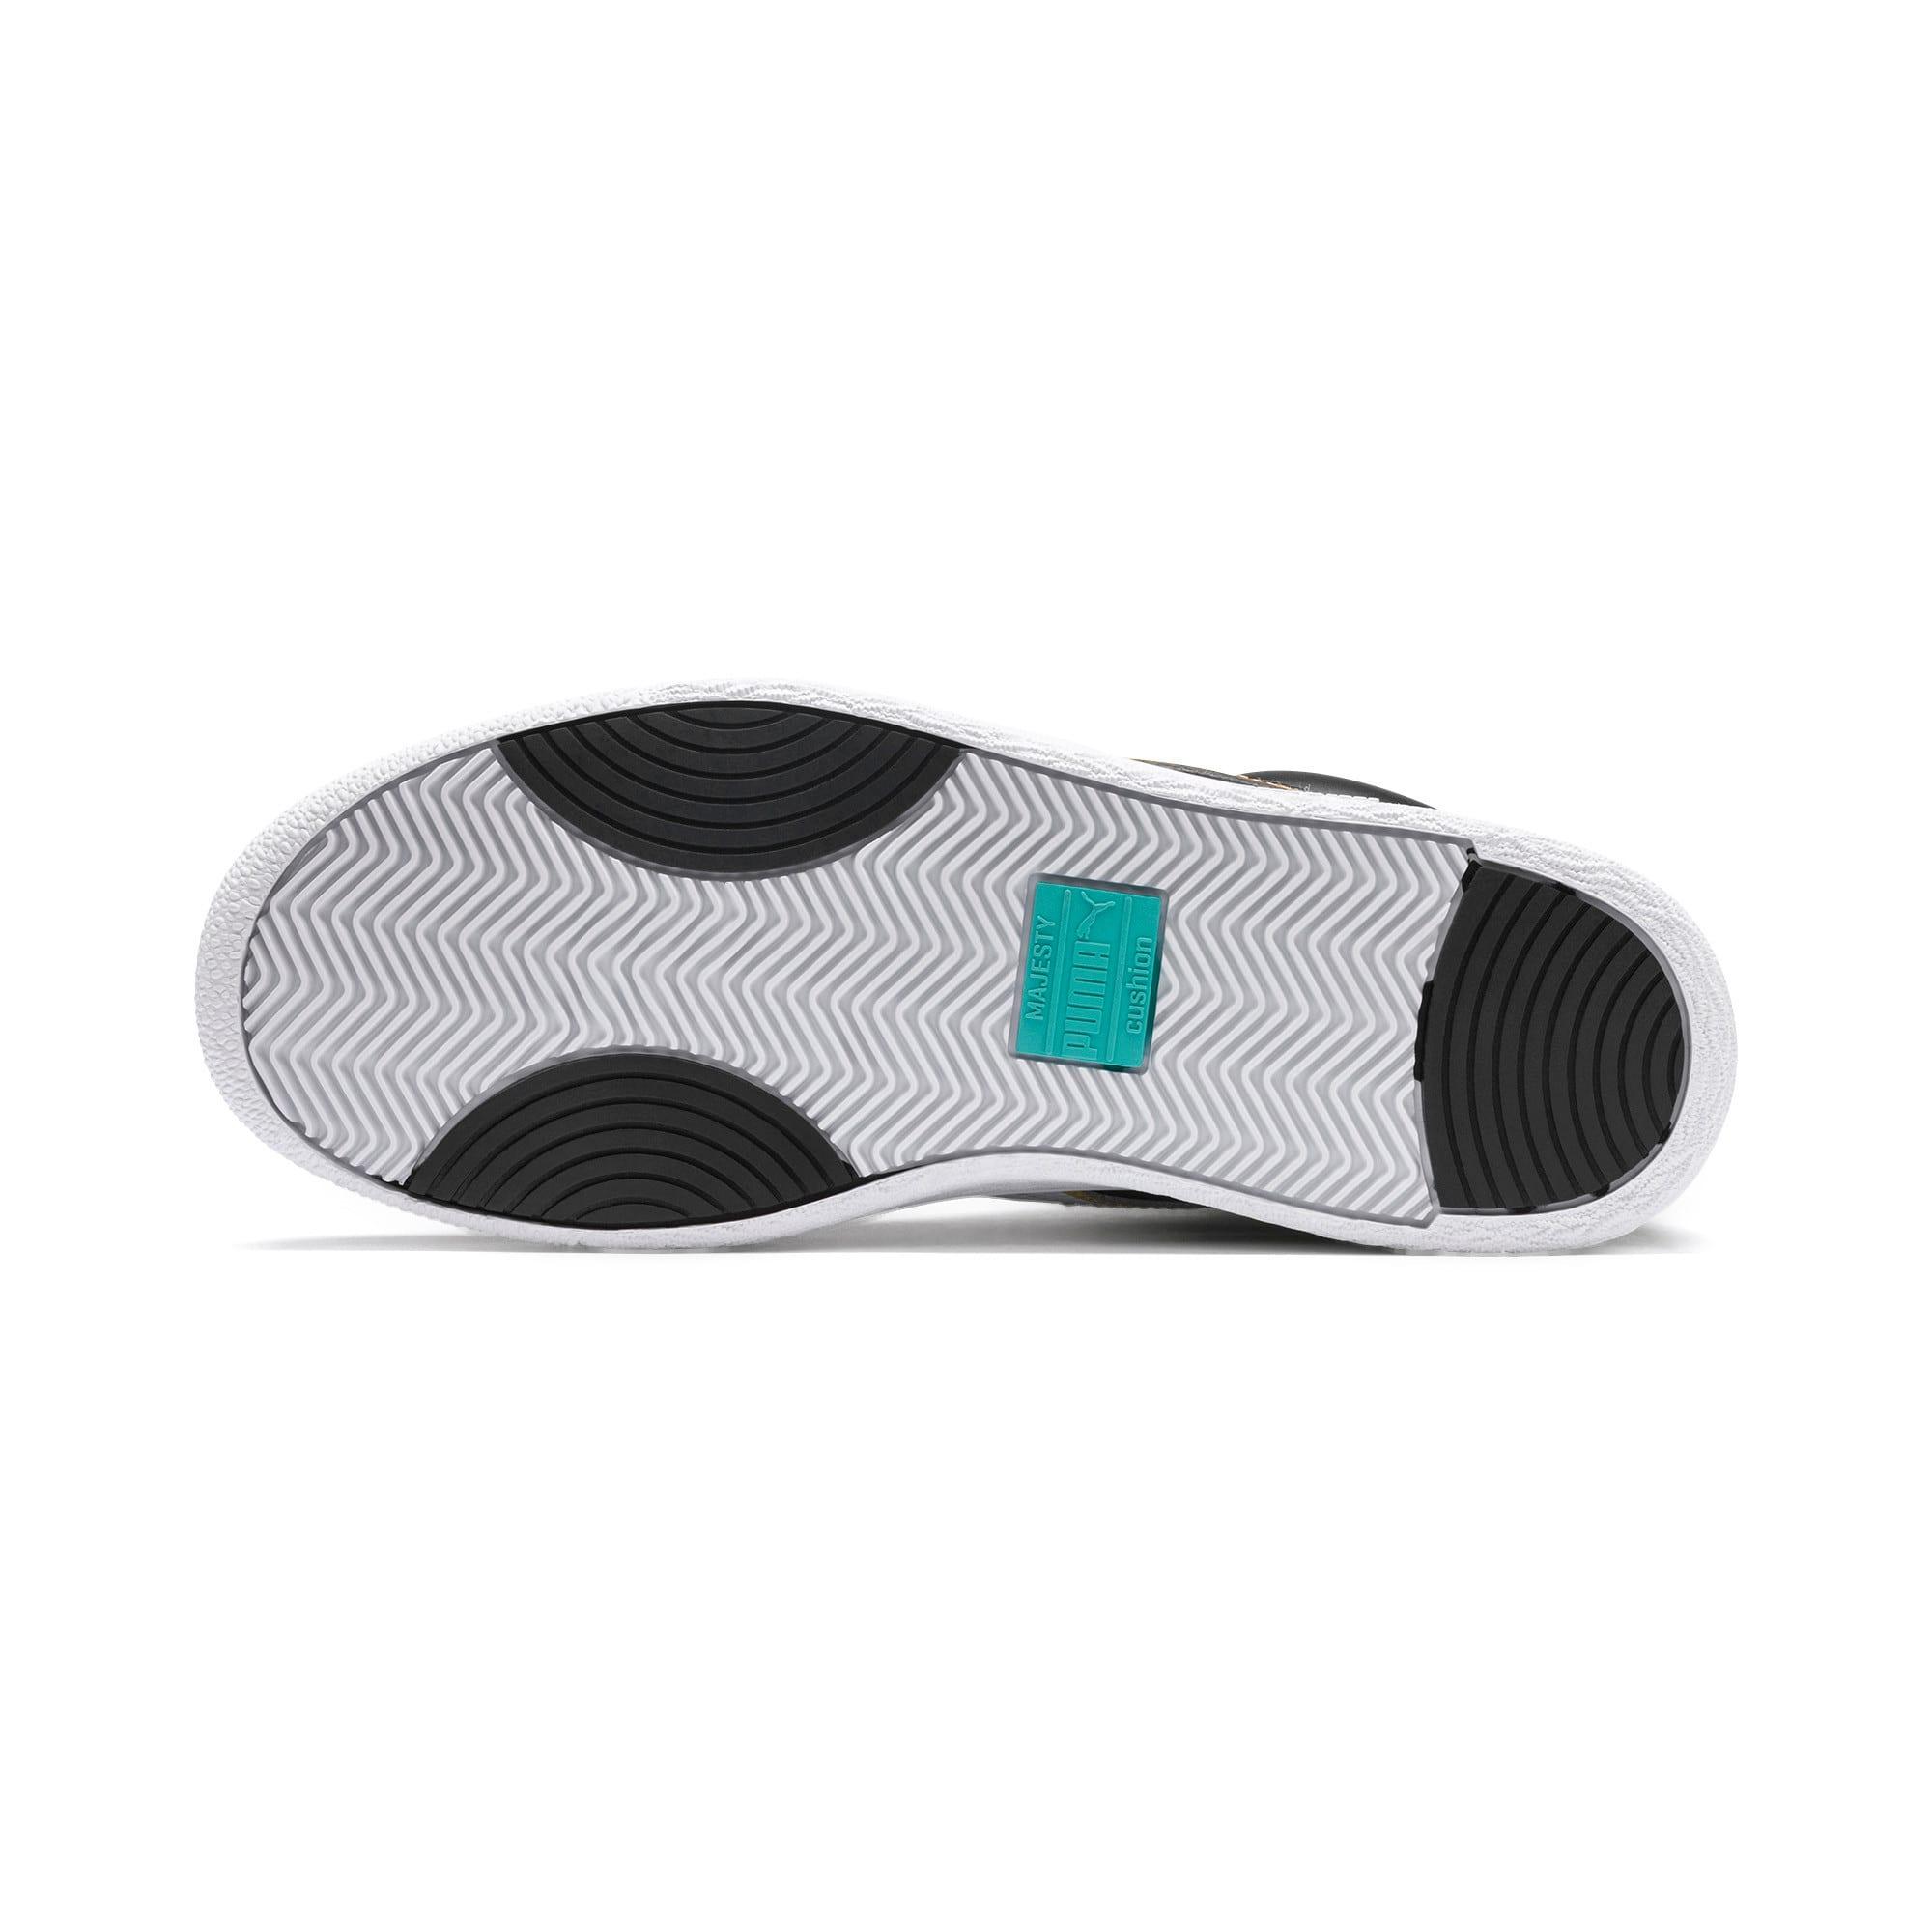 Miniatura 5 de Zapatos deportivos de caña media Ralph Sampson Hoops, Puma Blk-Puma Wht-Puma Wht, mediano